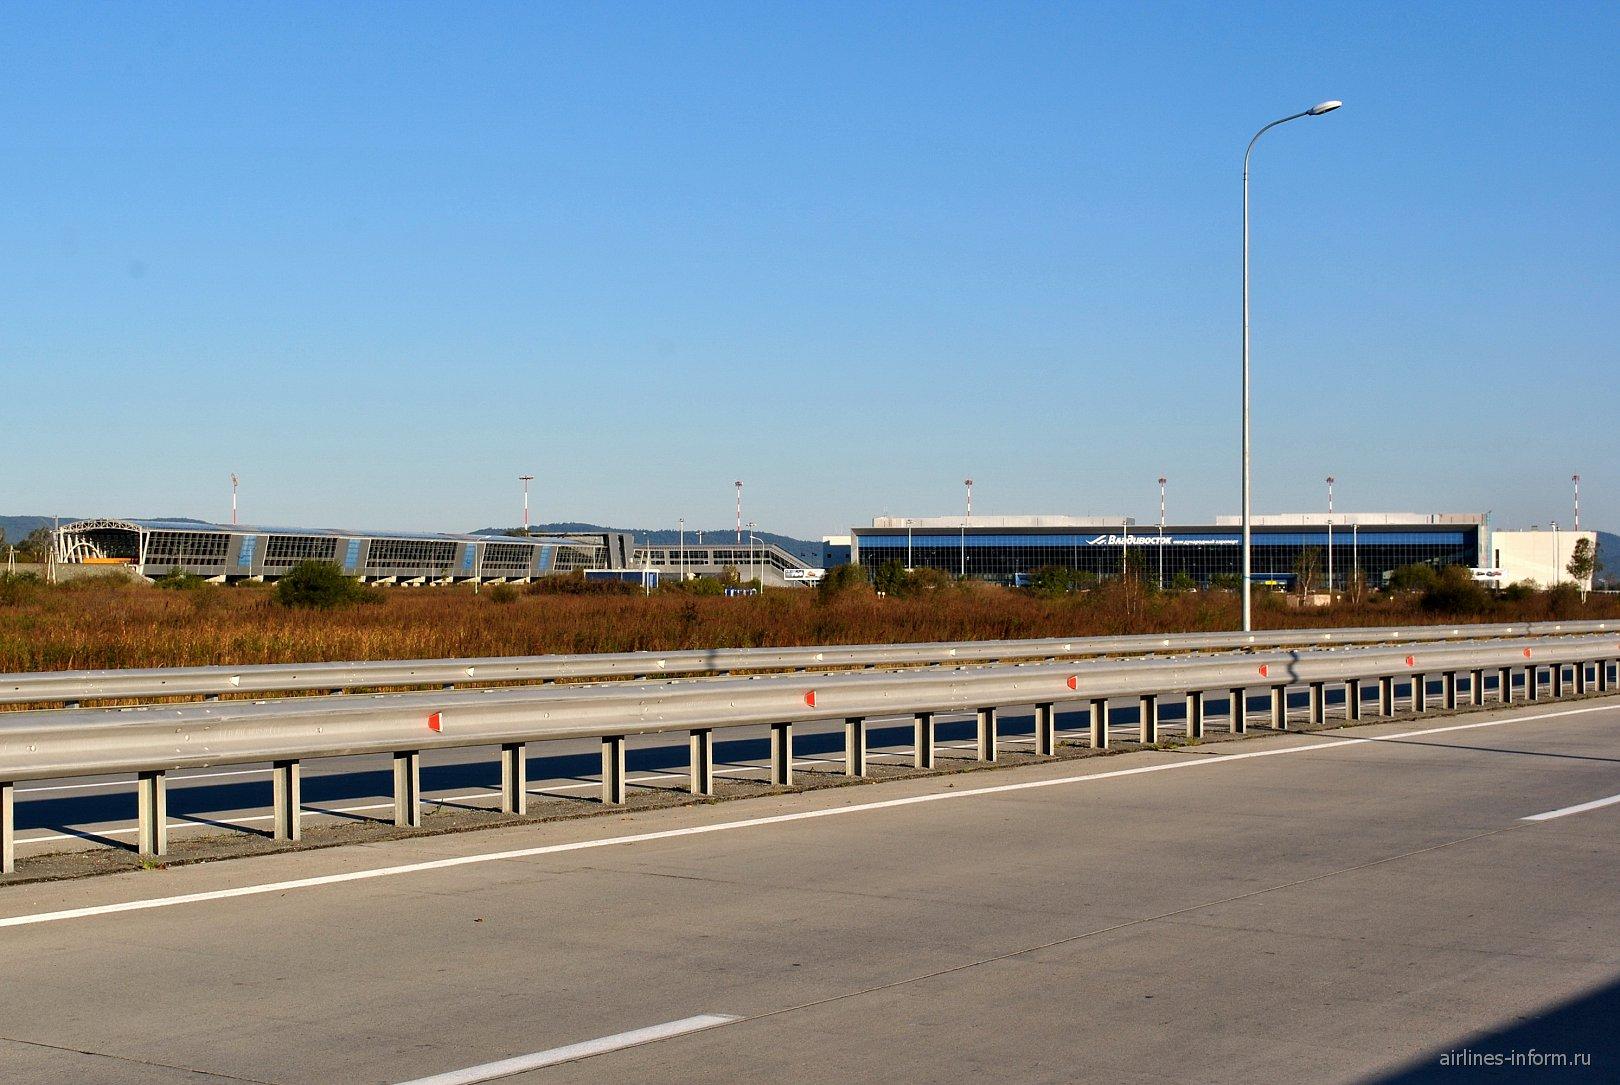 Вид на аэровокзал аэропорта Владивосток и терминал аэроэкспресса